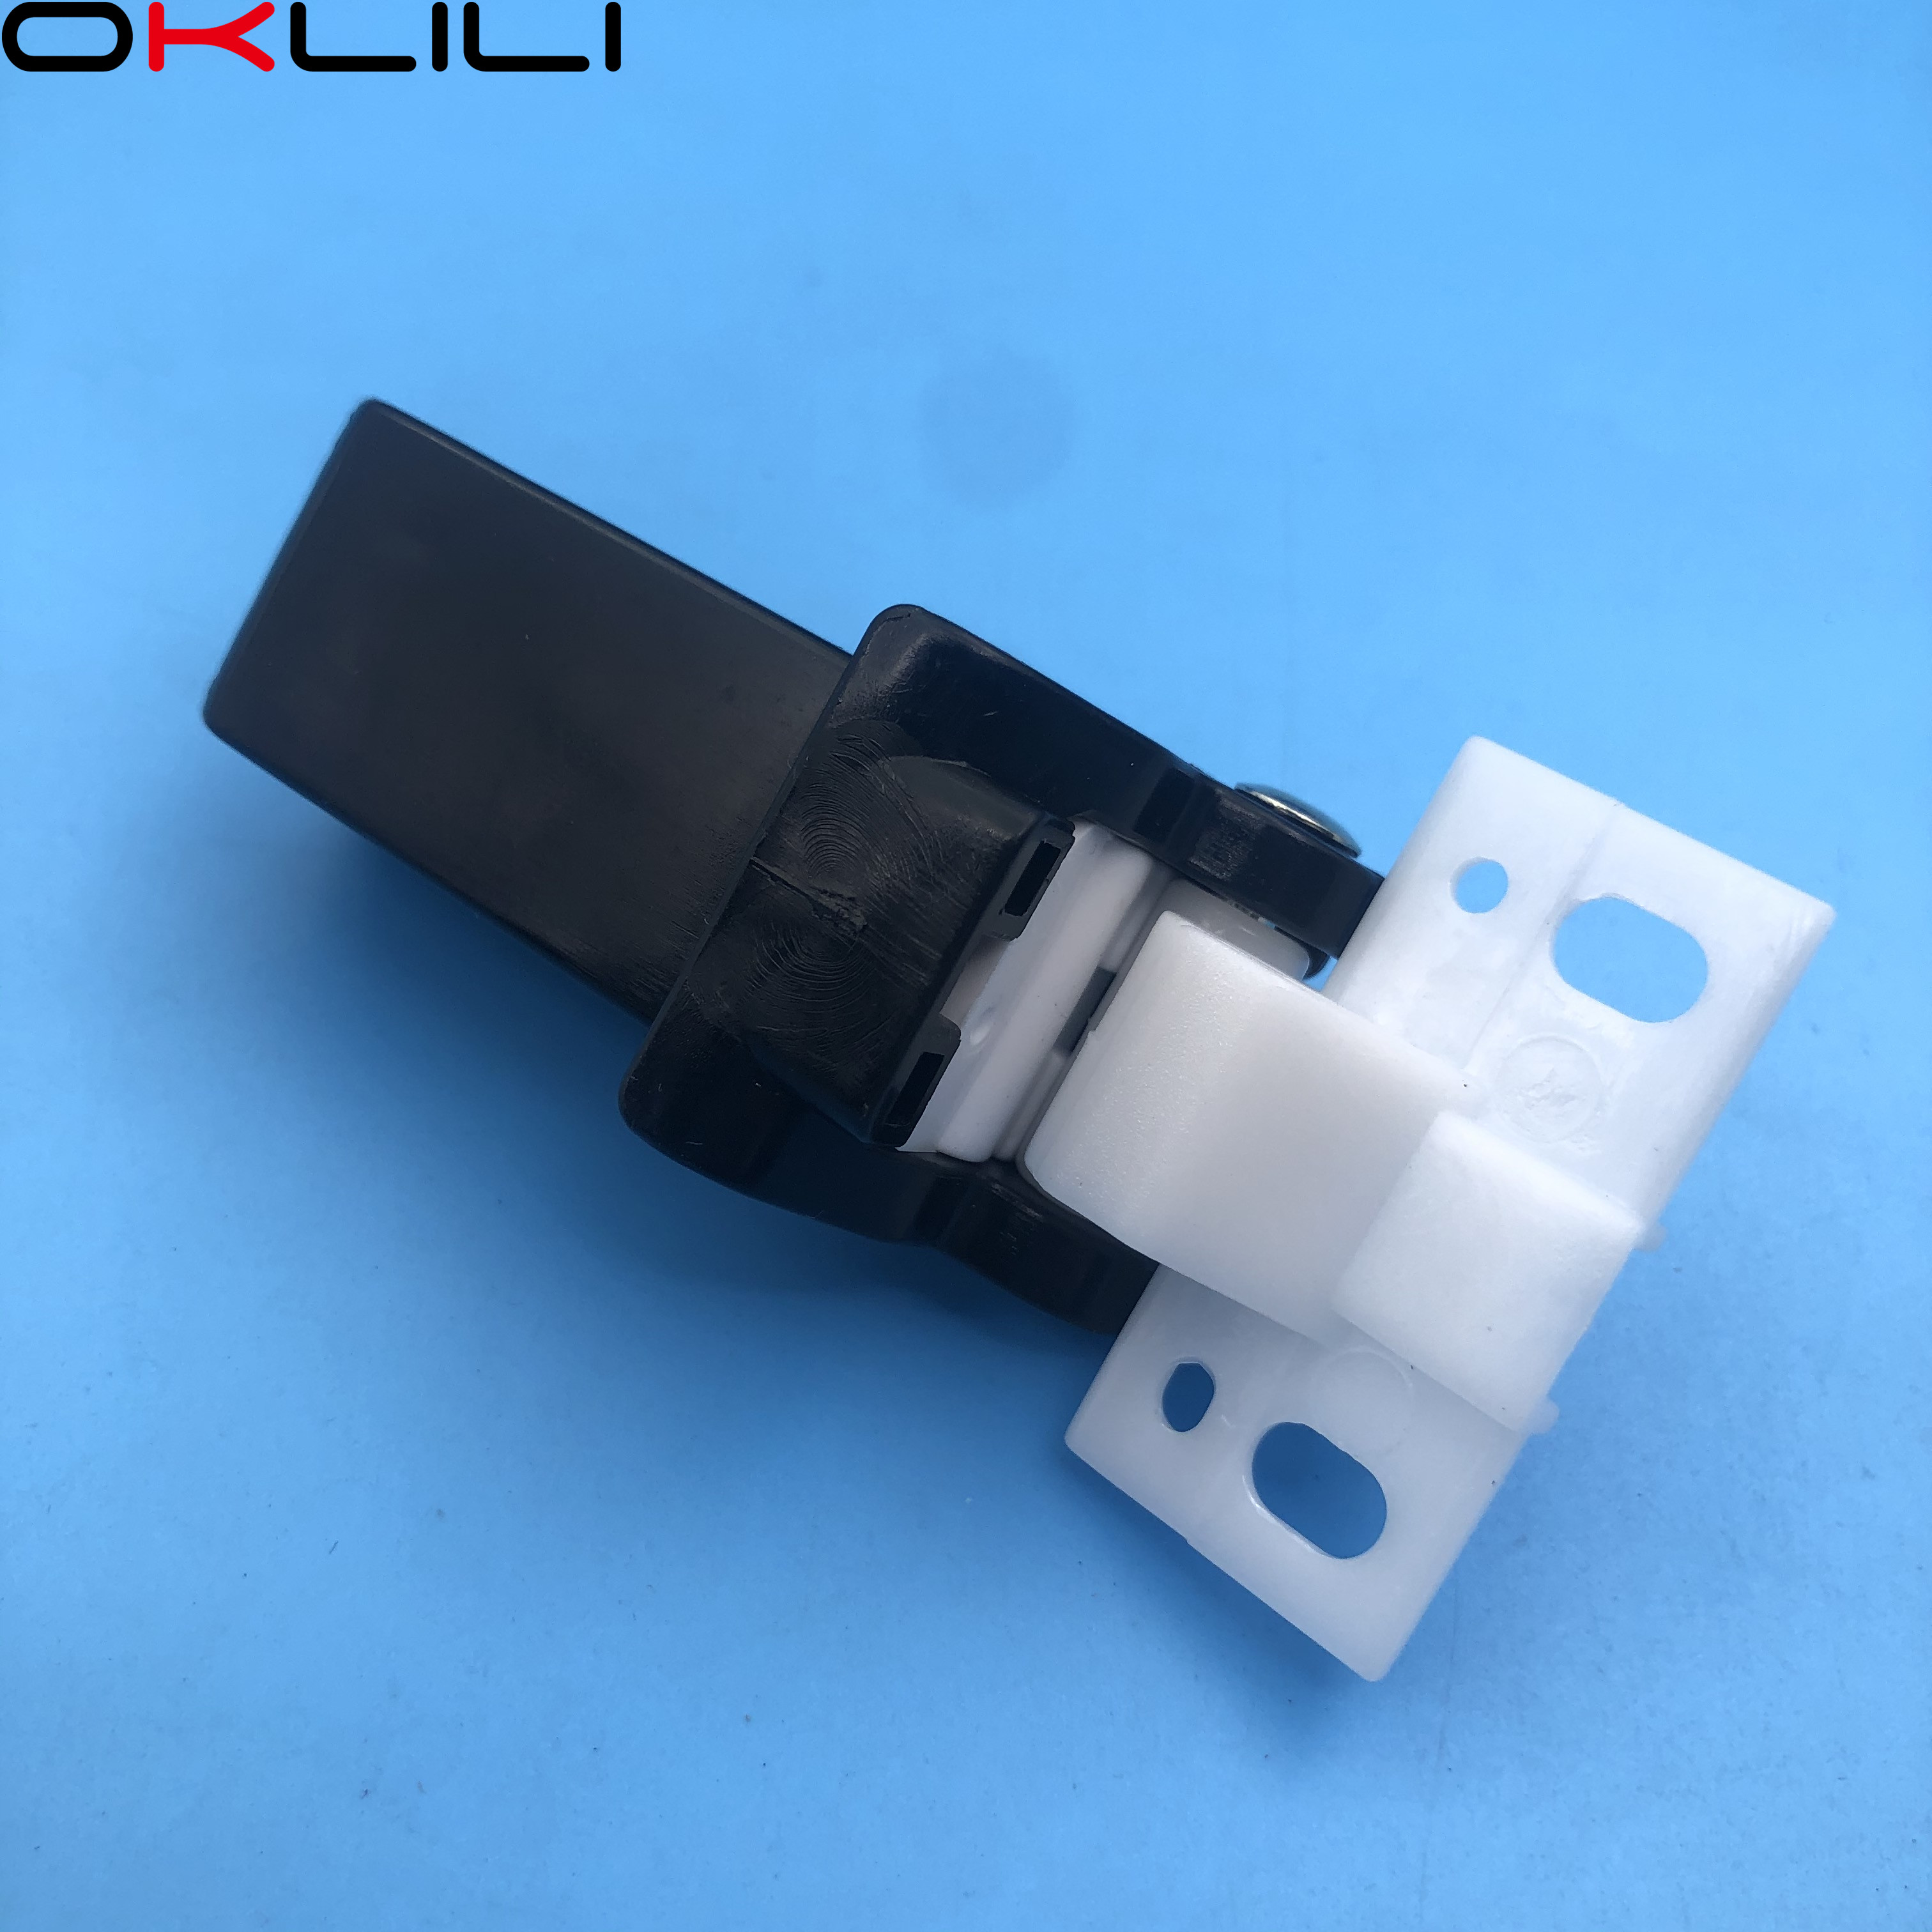 FL3-1430-000 FL3-2453-000 Doc Feeder ADF Hinge For Canon MF419 MF515 MF724 MF728 MF729 MF810 MF820 MF8030 MF8040 MF8050 MF8080